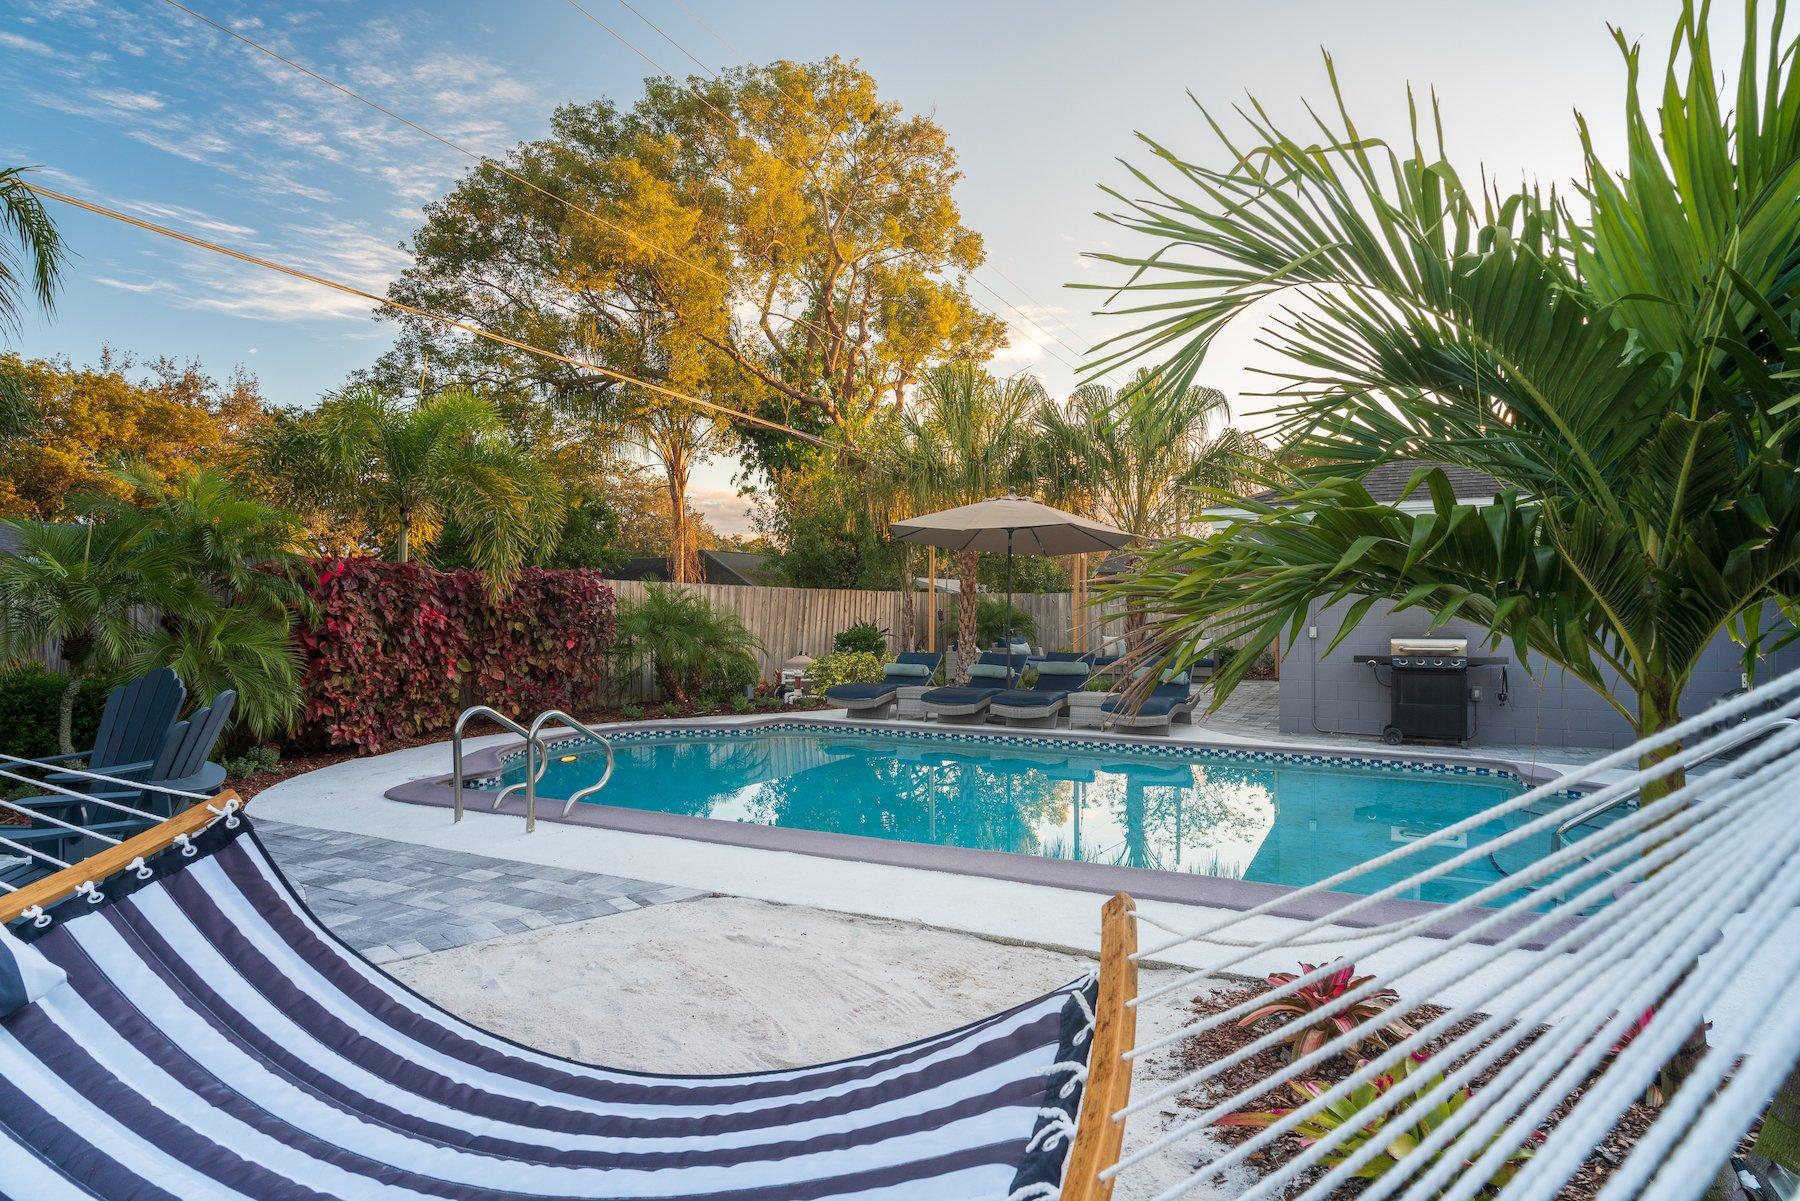 Proper plants for pools